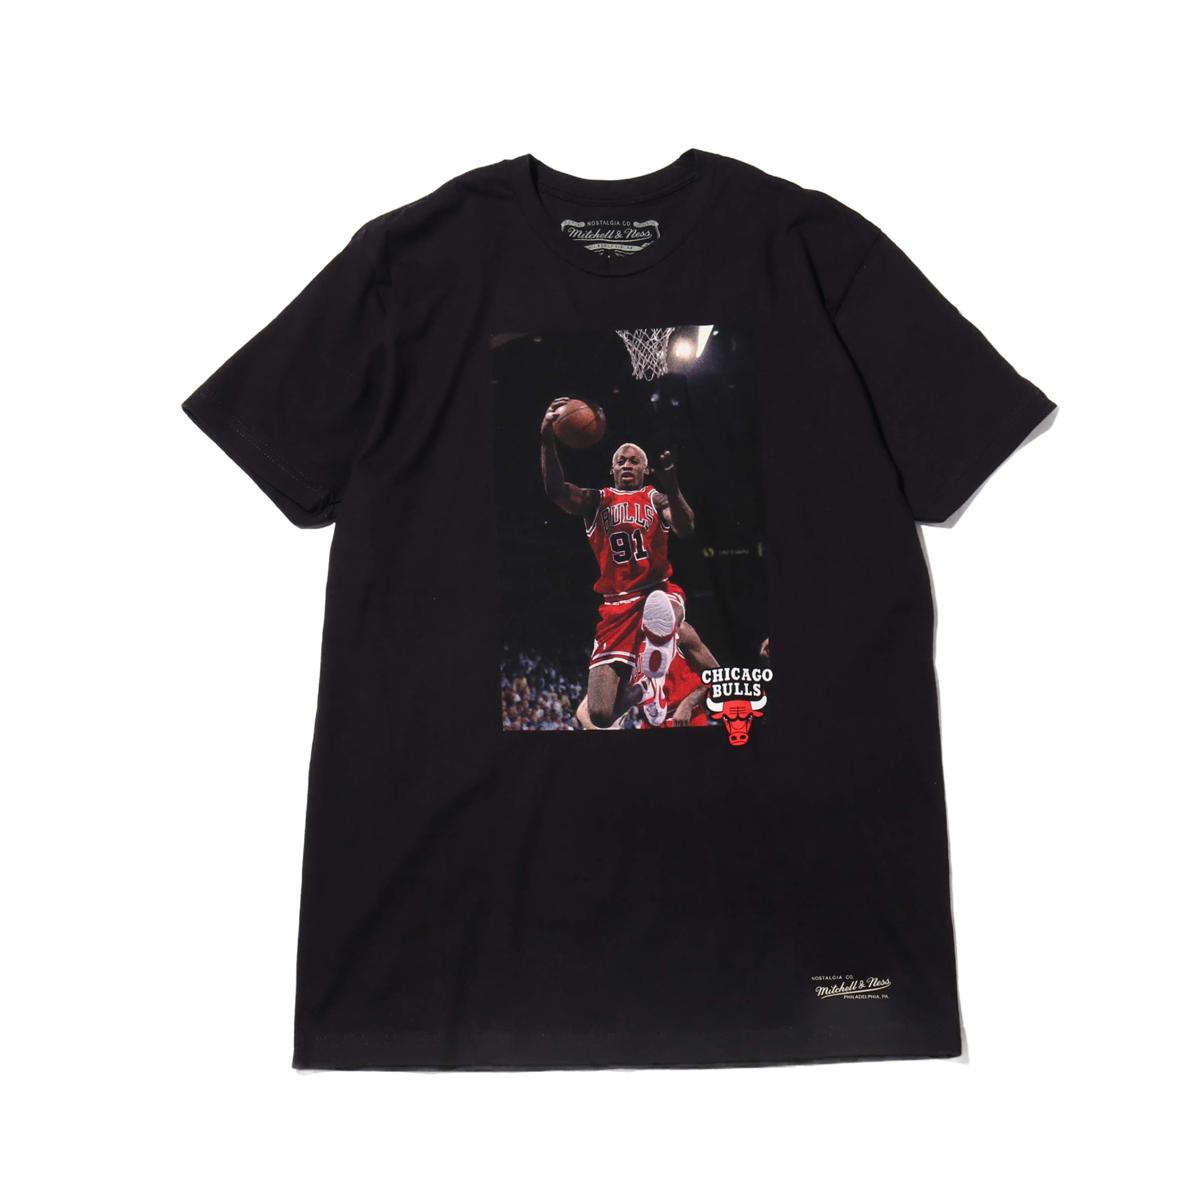 Mitchell & Ness Off Court Tshirts(ミッチェルアンドネス オフコート Tシャツ)BLACK【メンズ 半袖Tシャツ】19FW-I